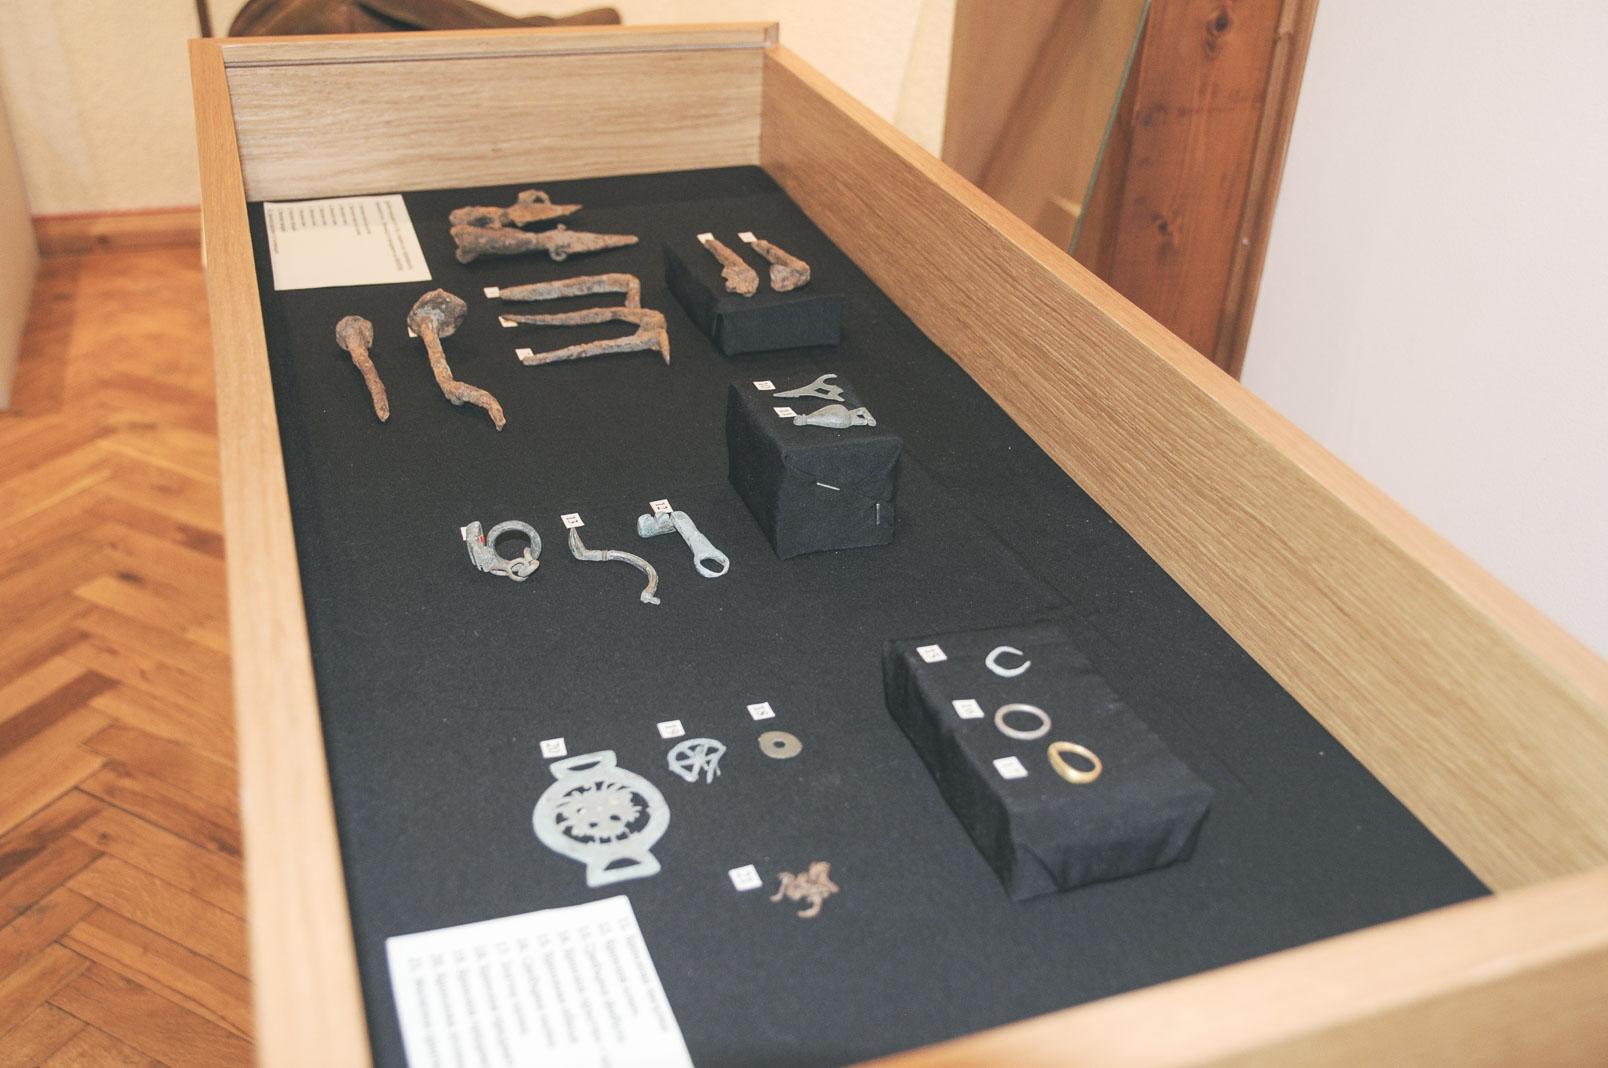 troyan-museum-jivotat-na-edna-idea-15